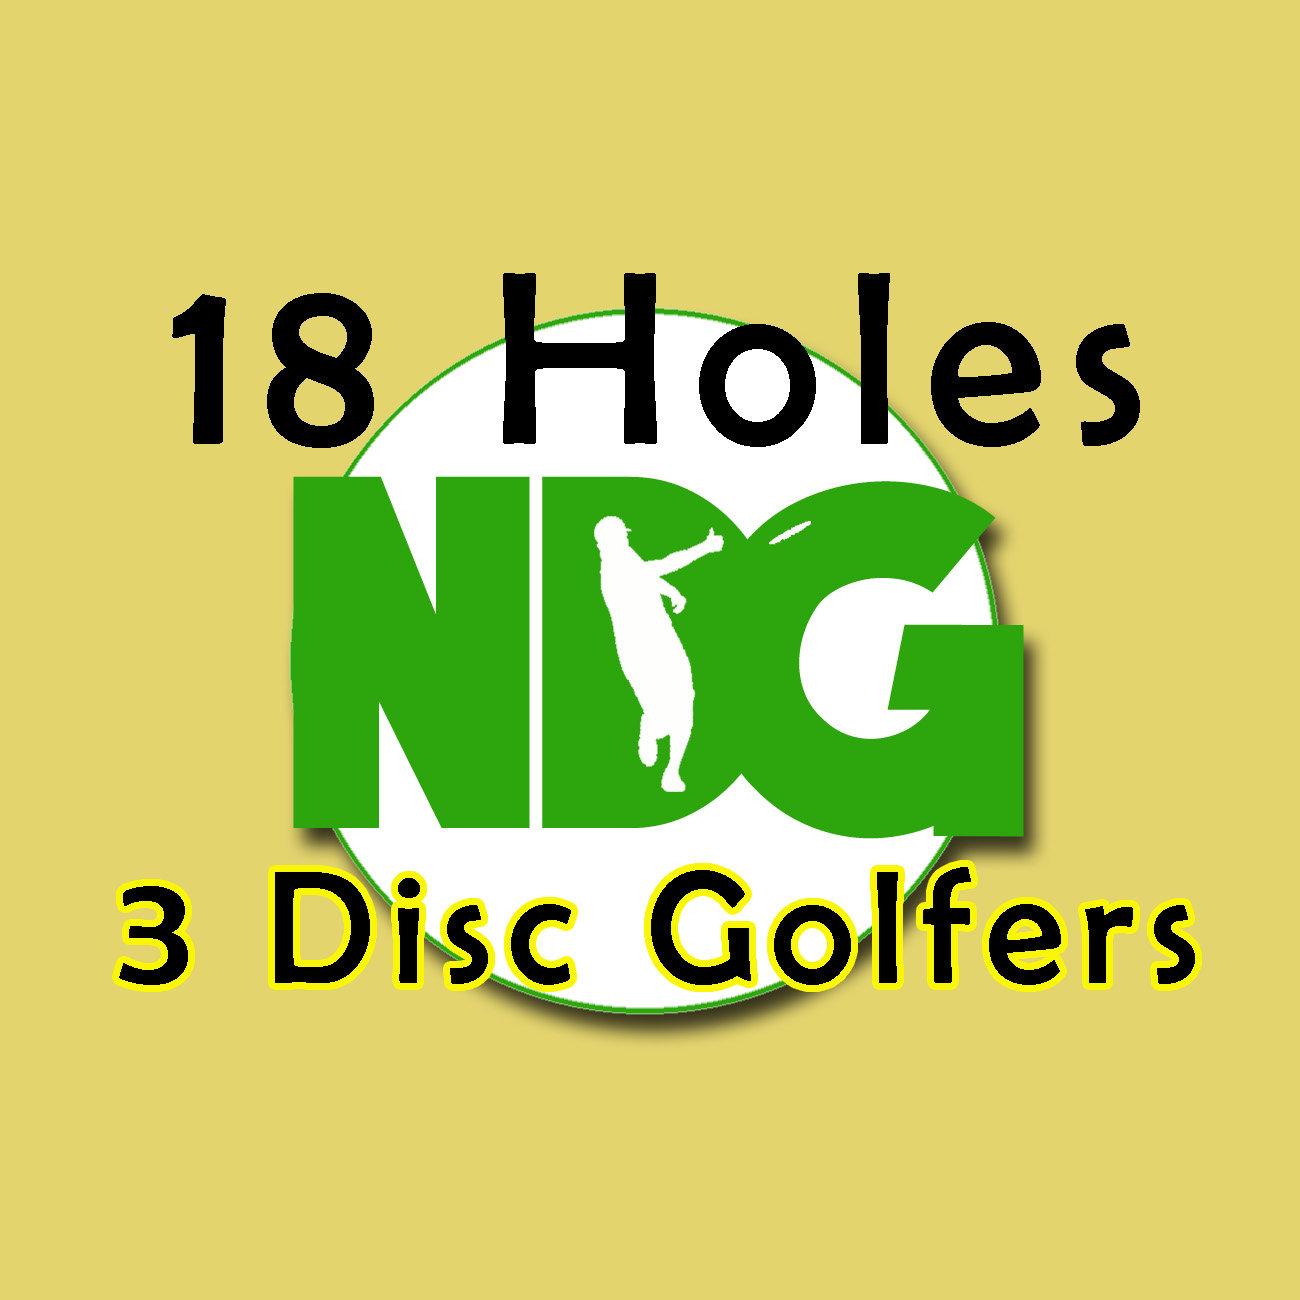 18 Holes: 3 Disc Golfers